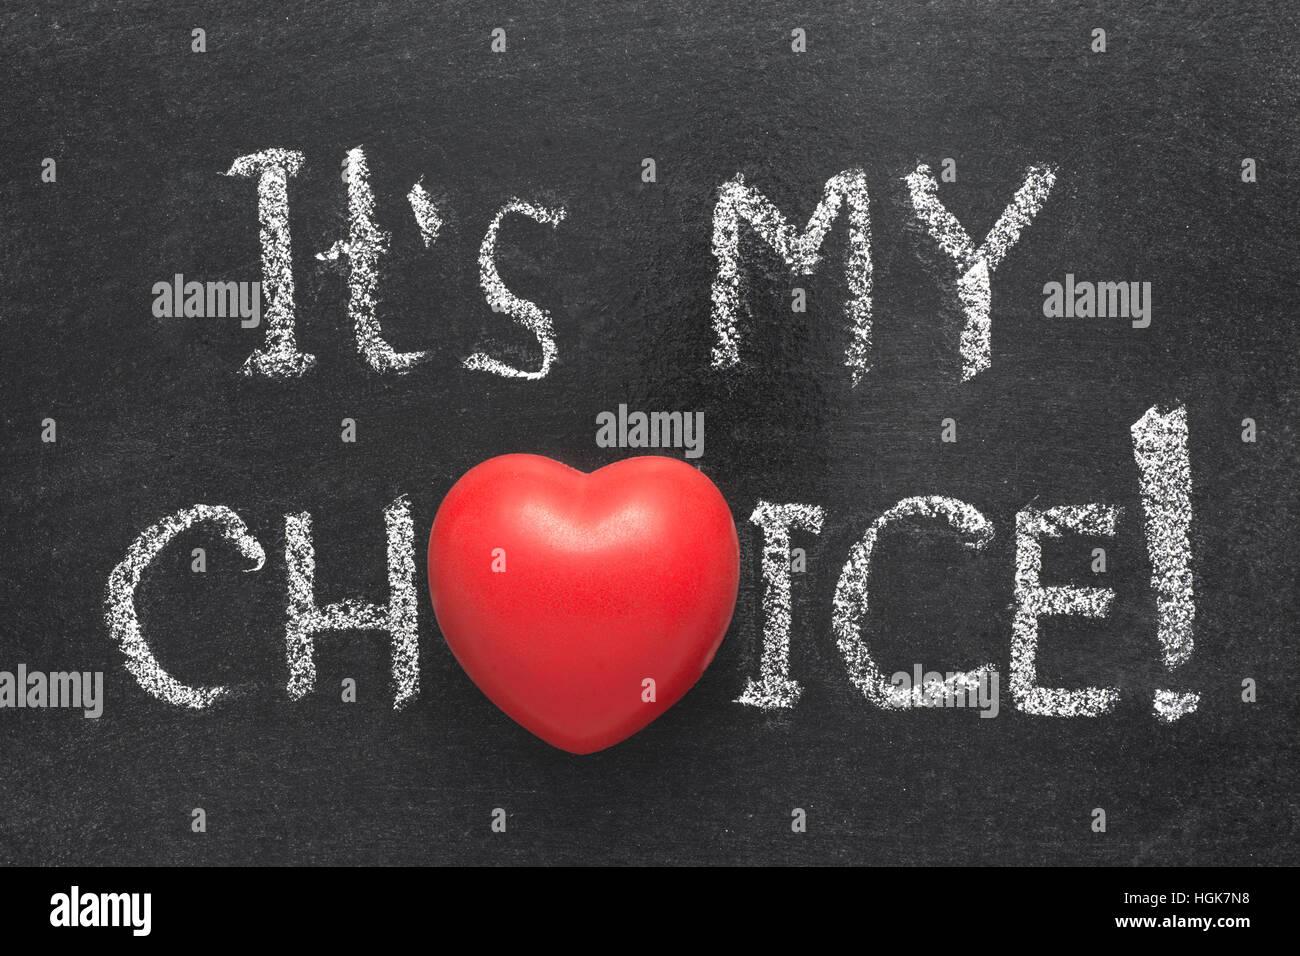 Its my choice exclamation handwritten on blackboard with heart its my choice exclamation handwritten on blackboard with heart symbol instead of o biocorpaavc